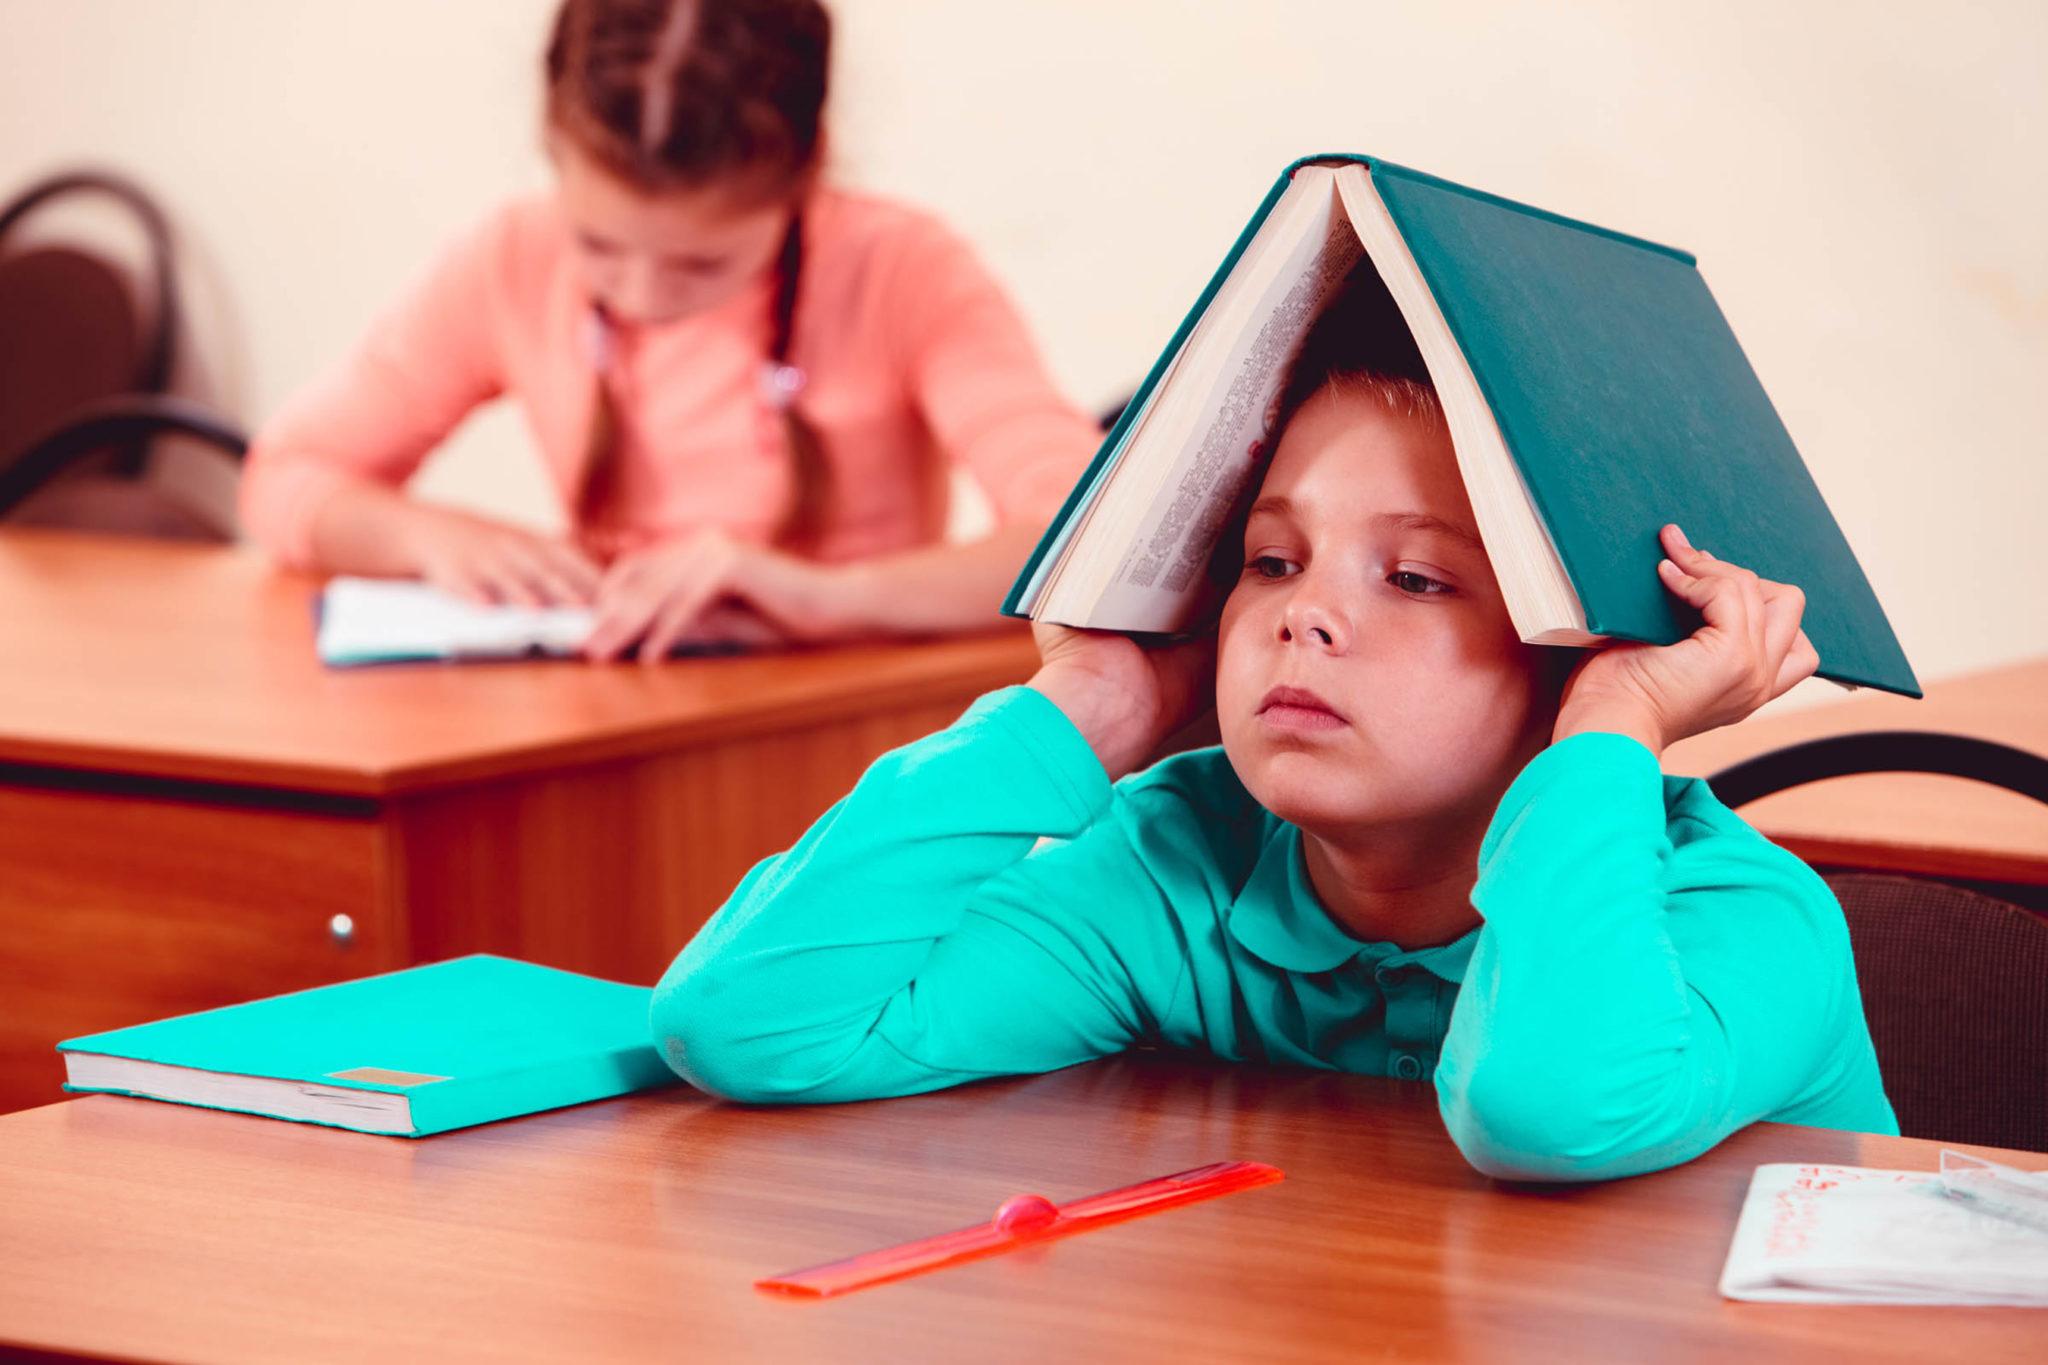 ADHD impacts school